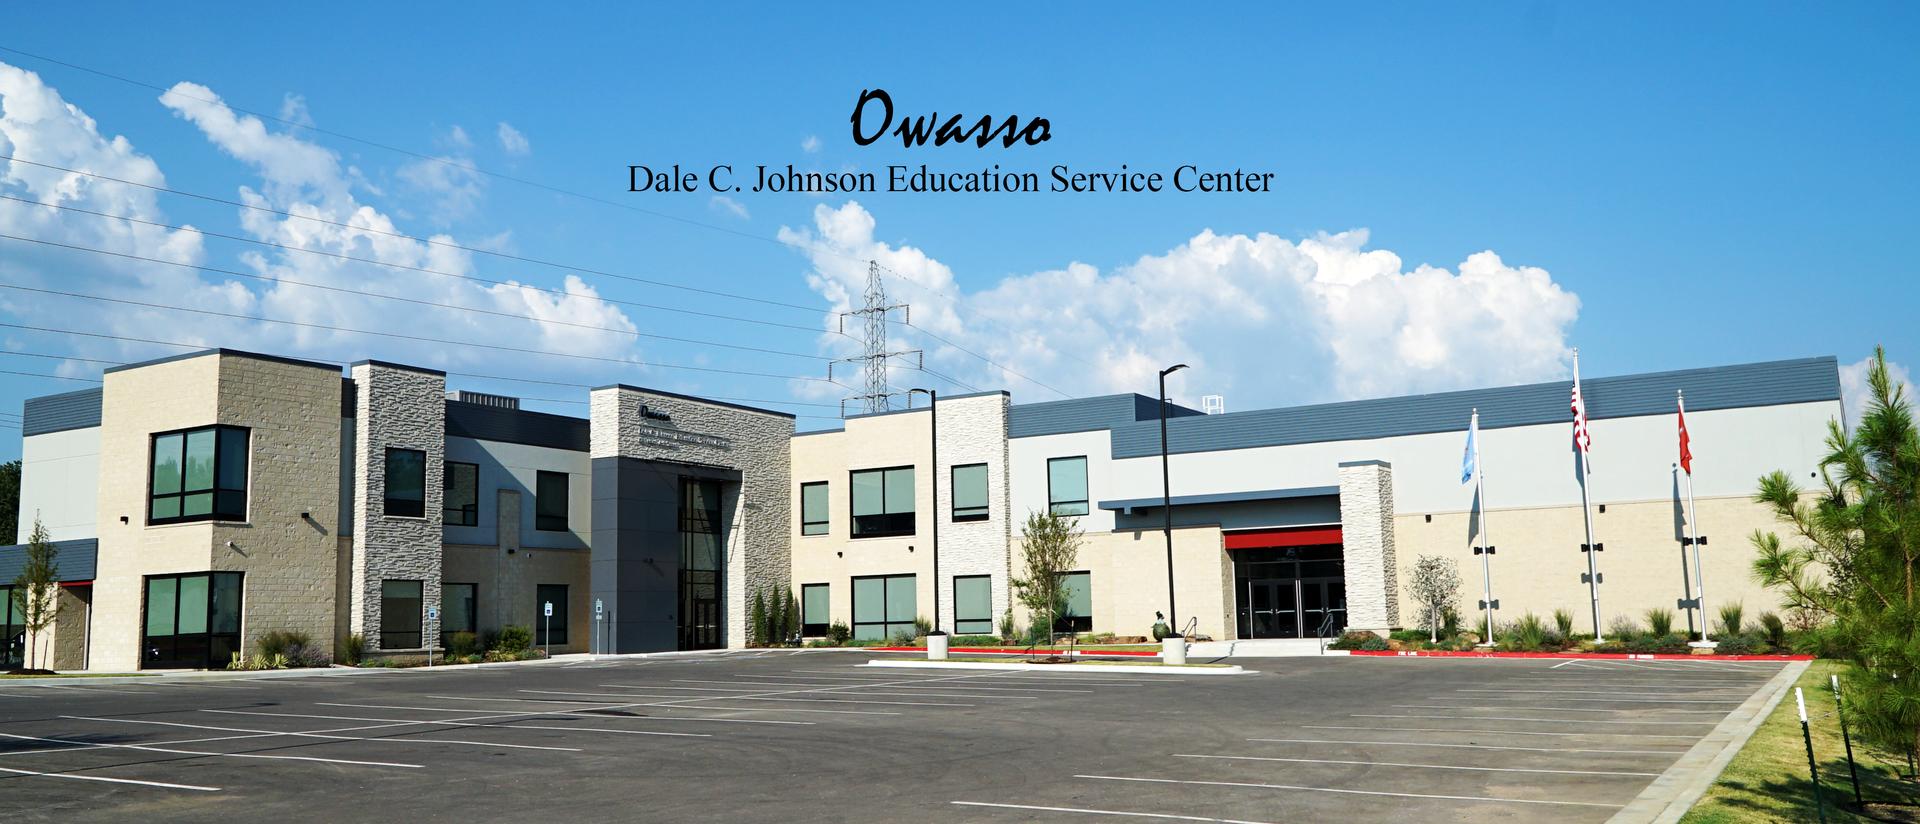 Dale C. Johnson Education Service Center